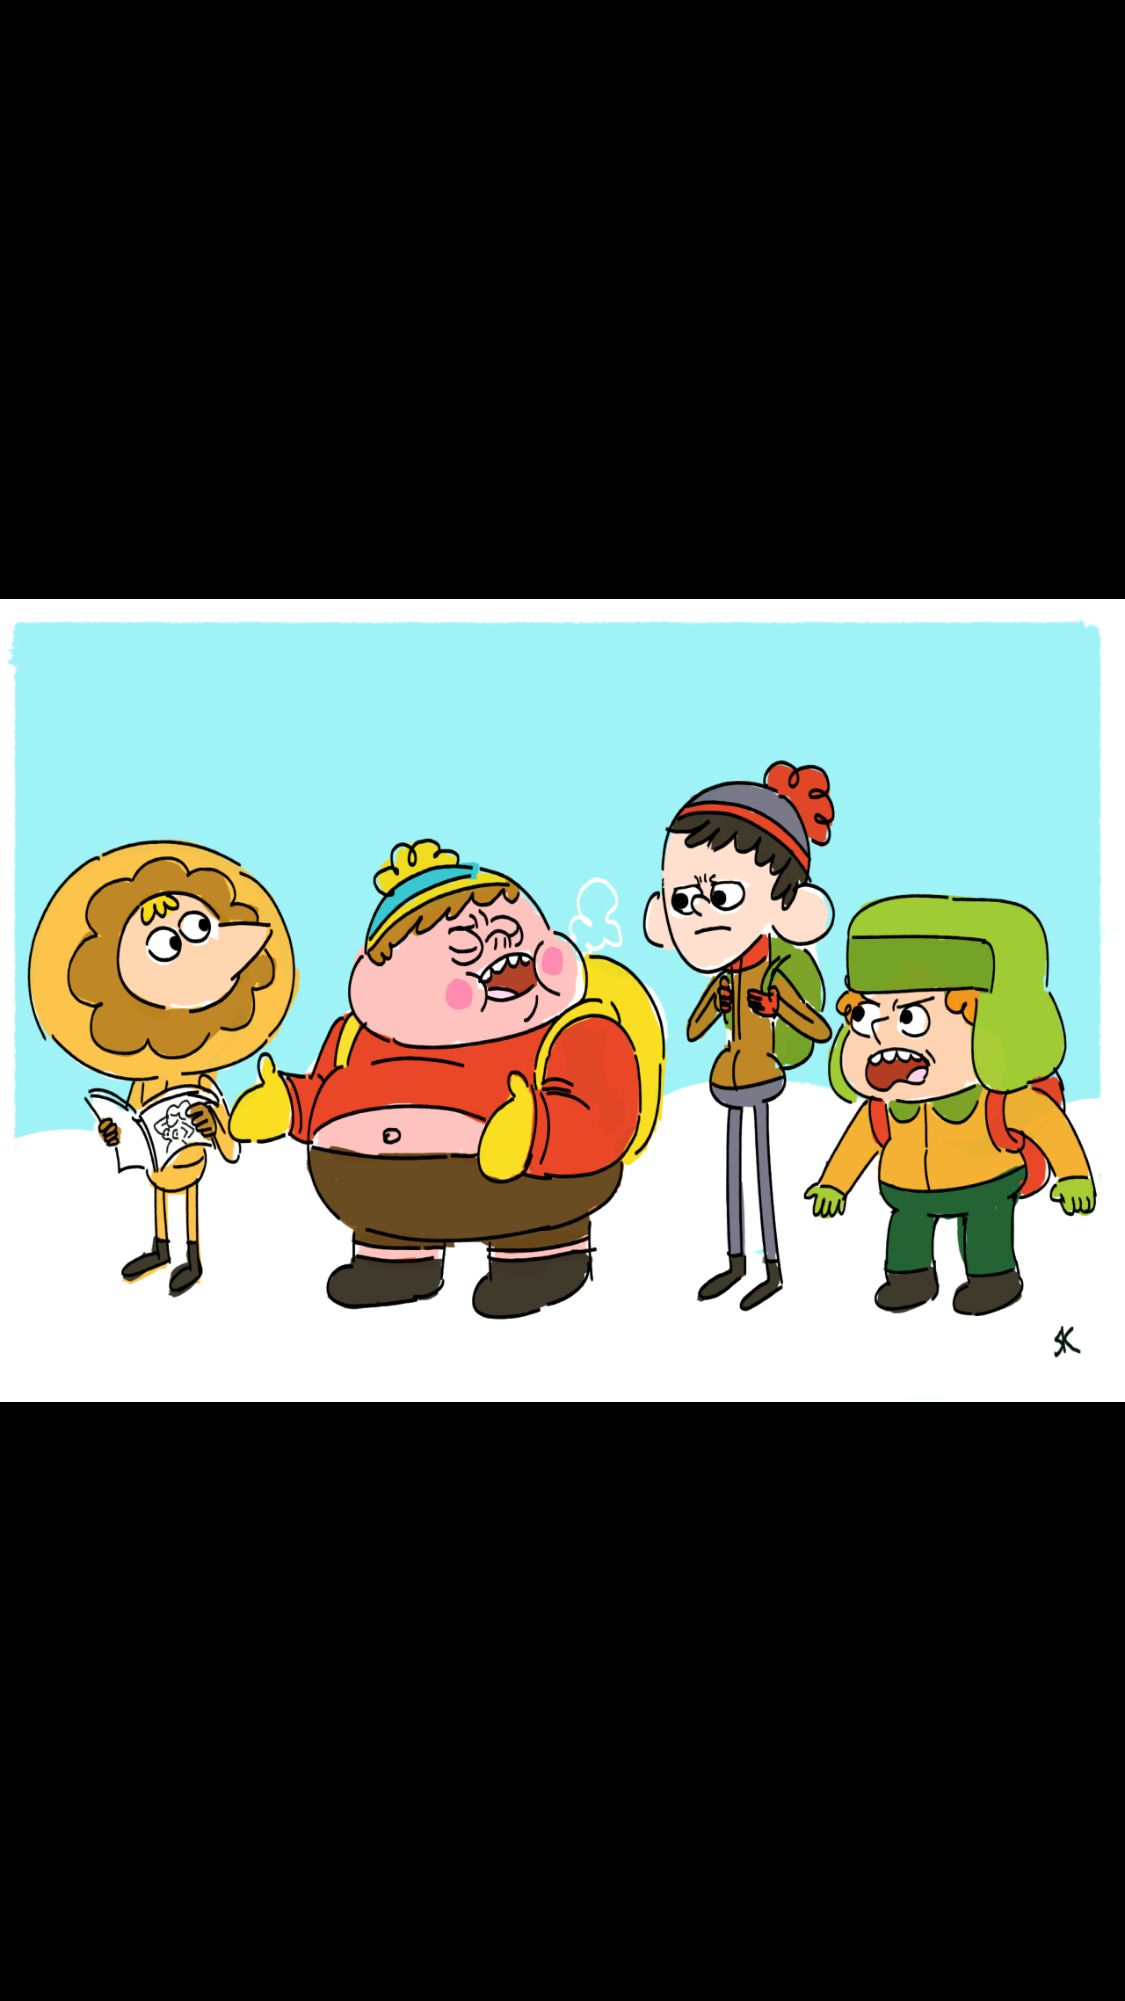 South Park - Clarence Style - Kyle Broflovski - Eric